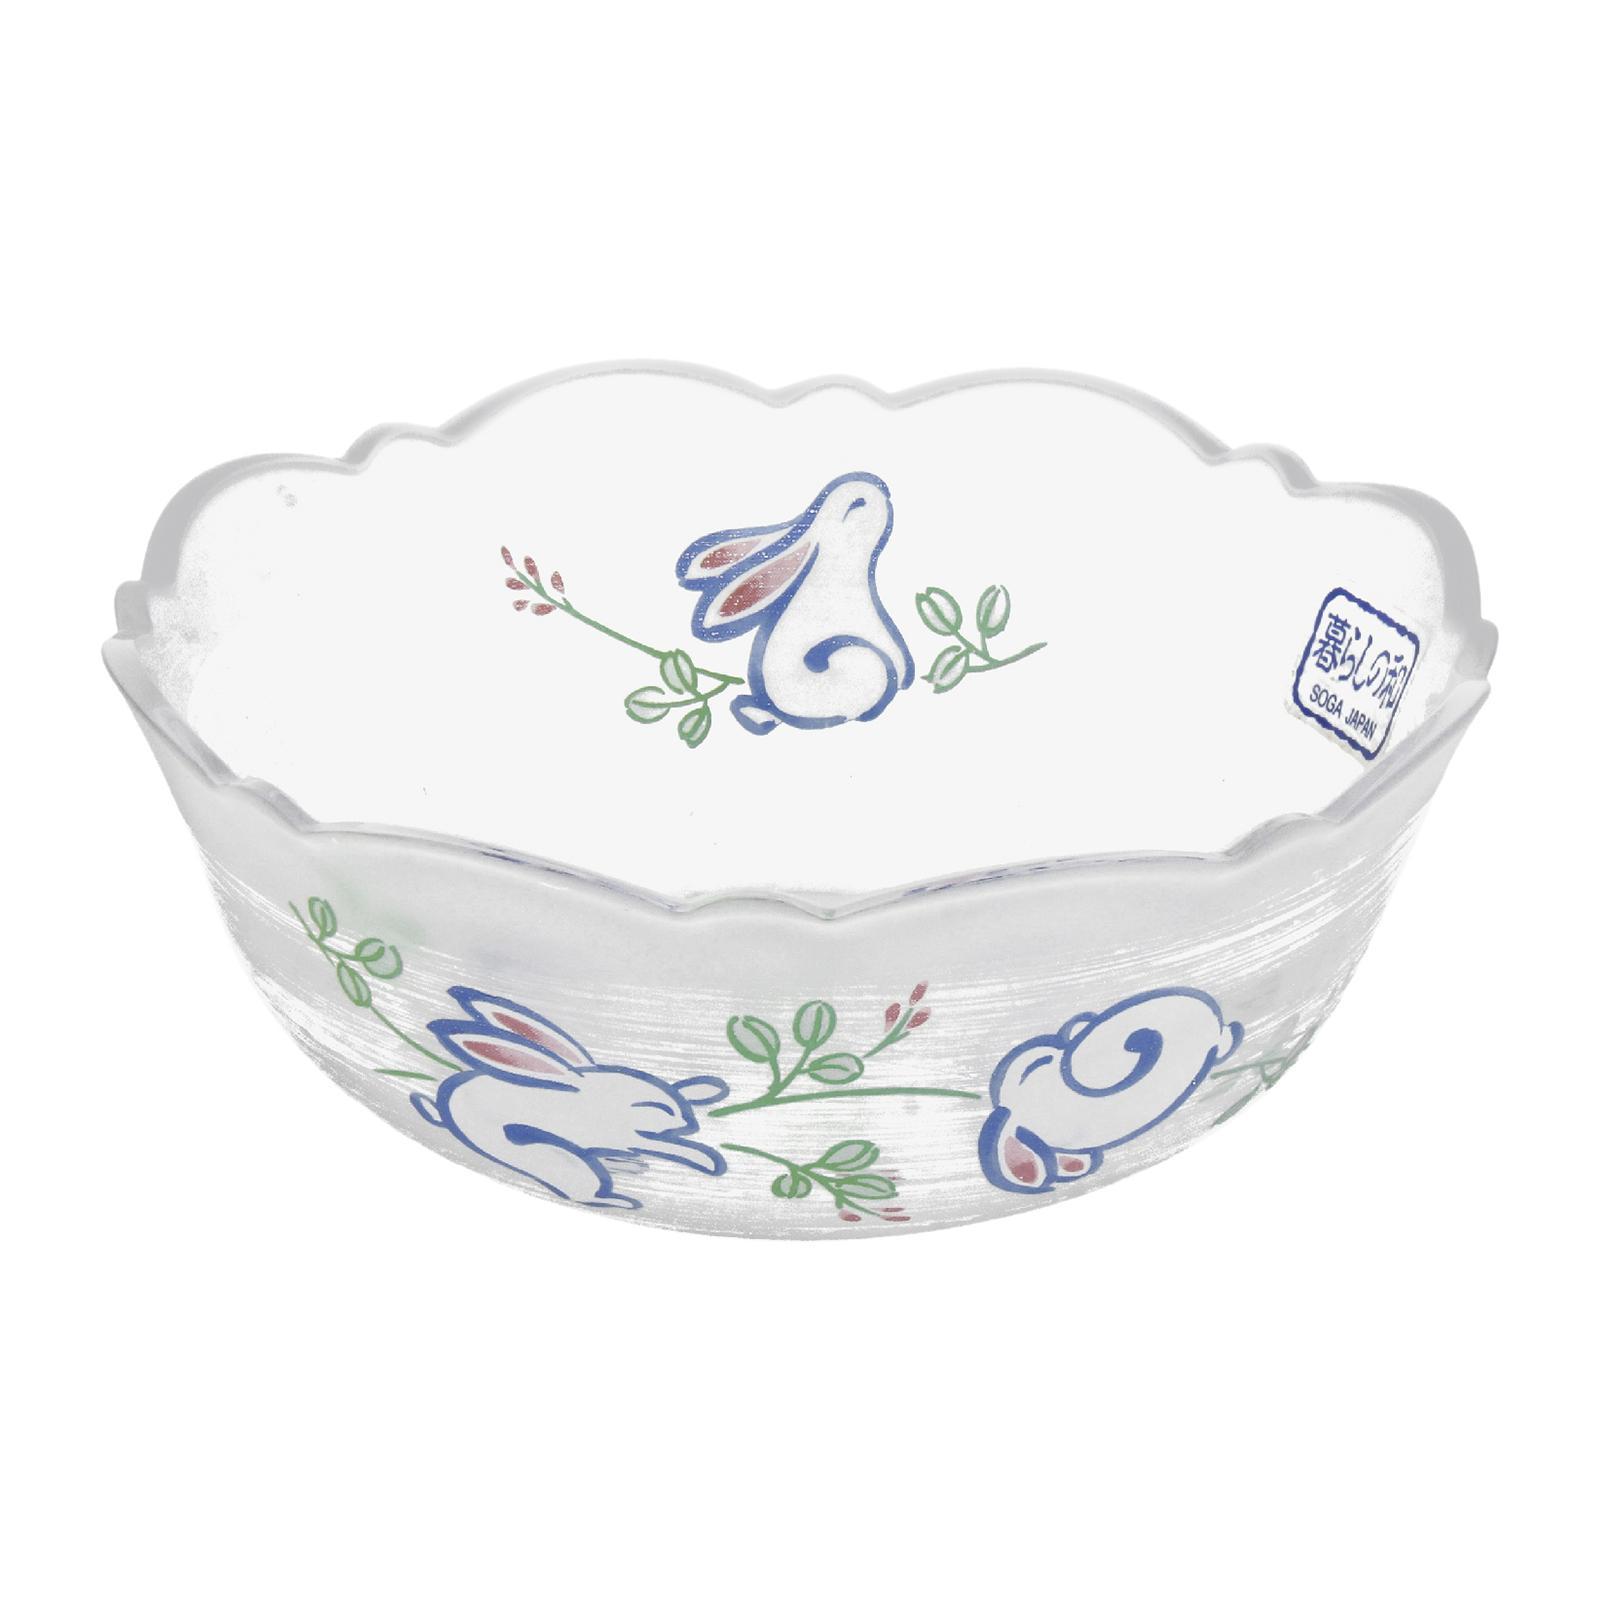 Soga Rabbit Frosted Glass Bowl 5 5-PCS Set